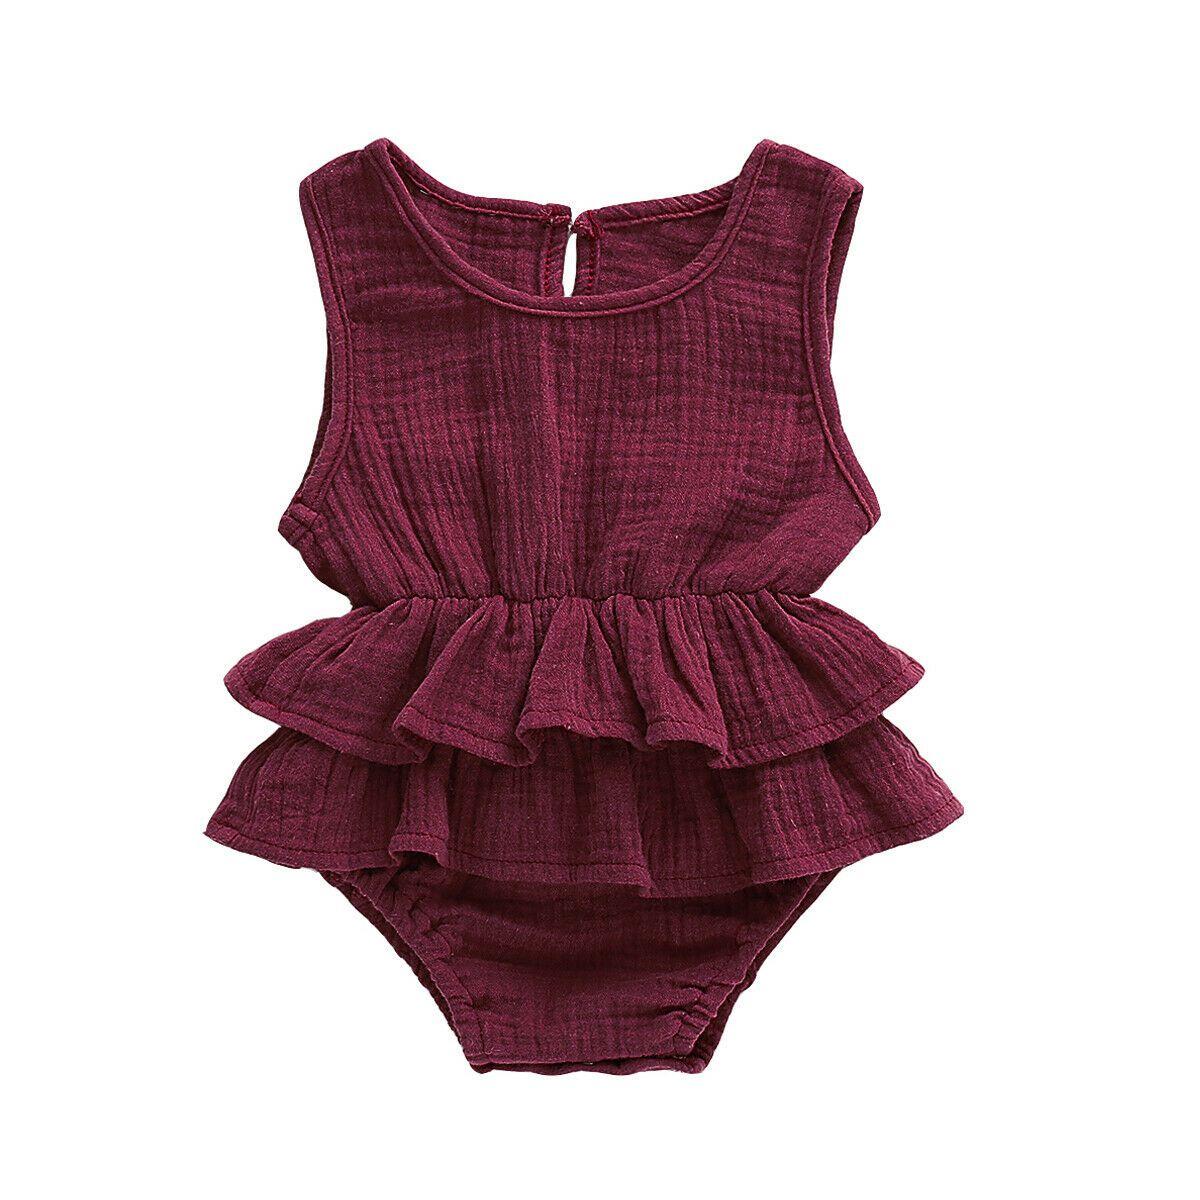 Hhchenyulemon Summer Kids Baby Girl Romper Jumpsuit Bodysuit Outfit Tutu Clothes 0 24m Walmart Com Baby Girl Summer Girls Rompers Baby Girl Outfits Summer